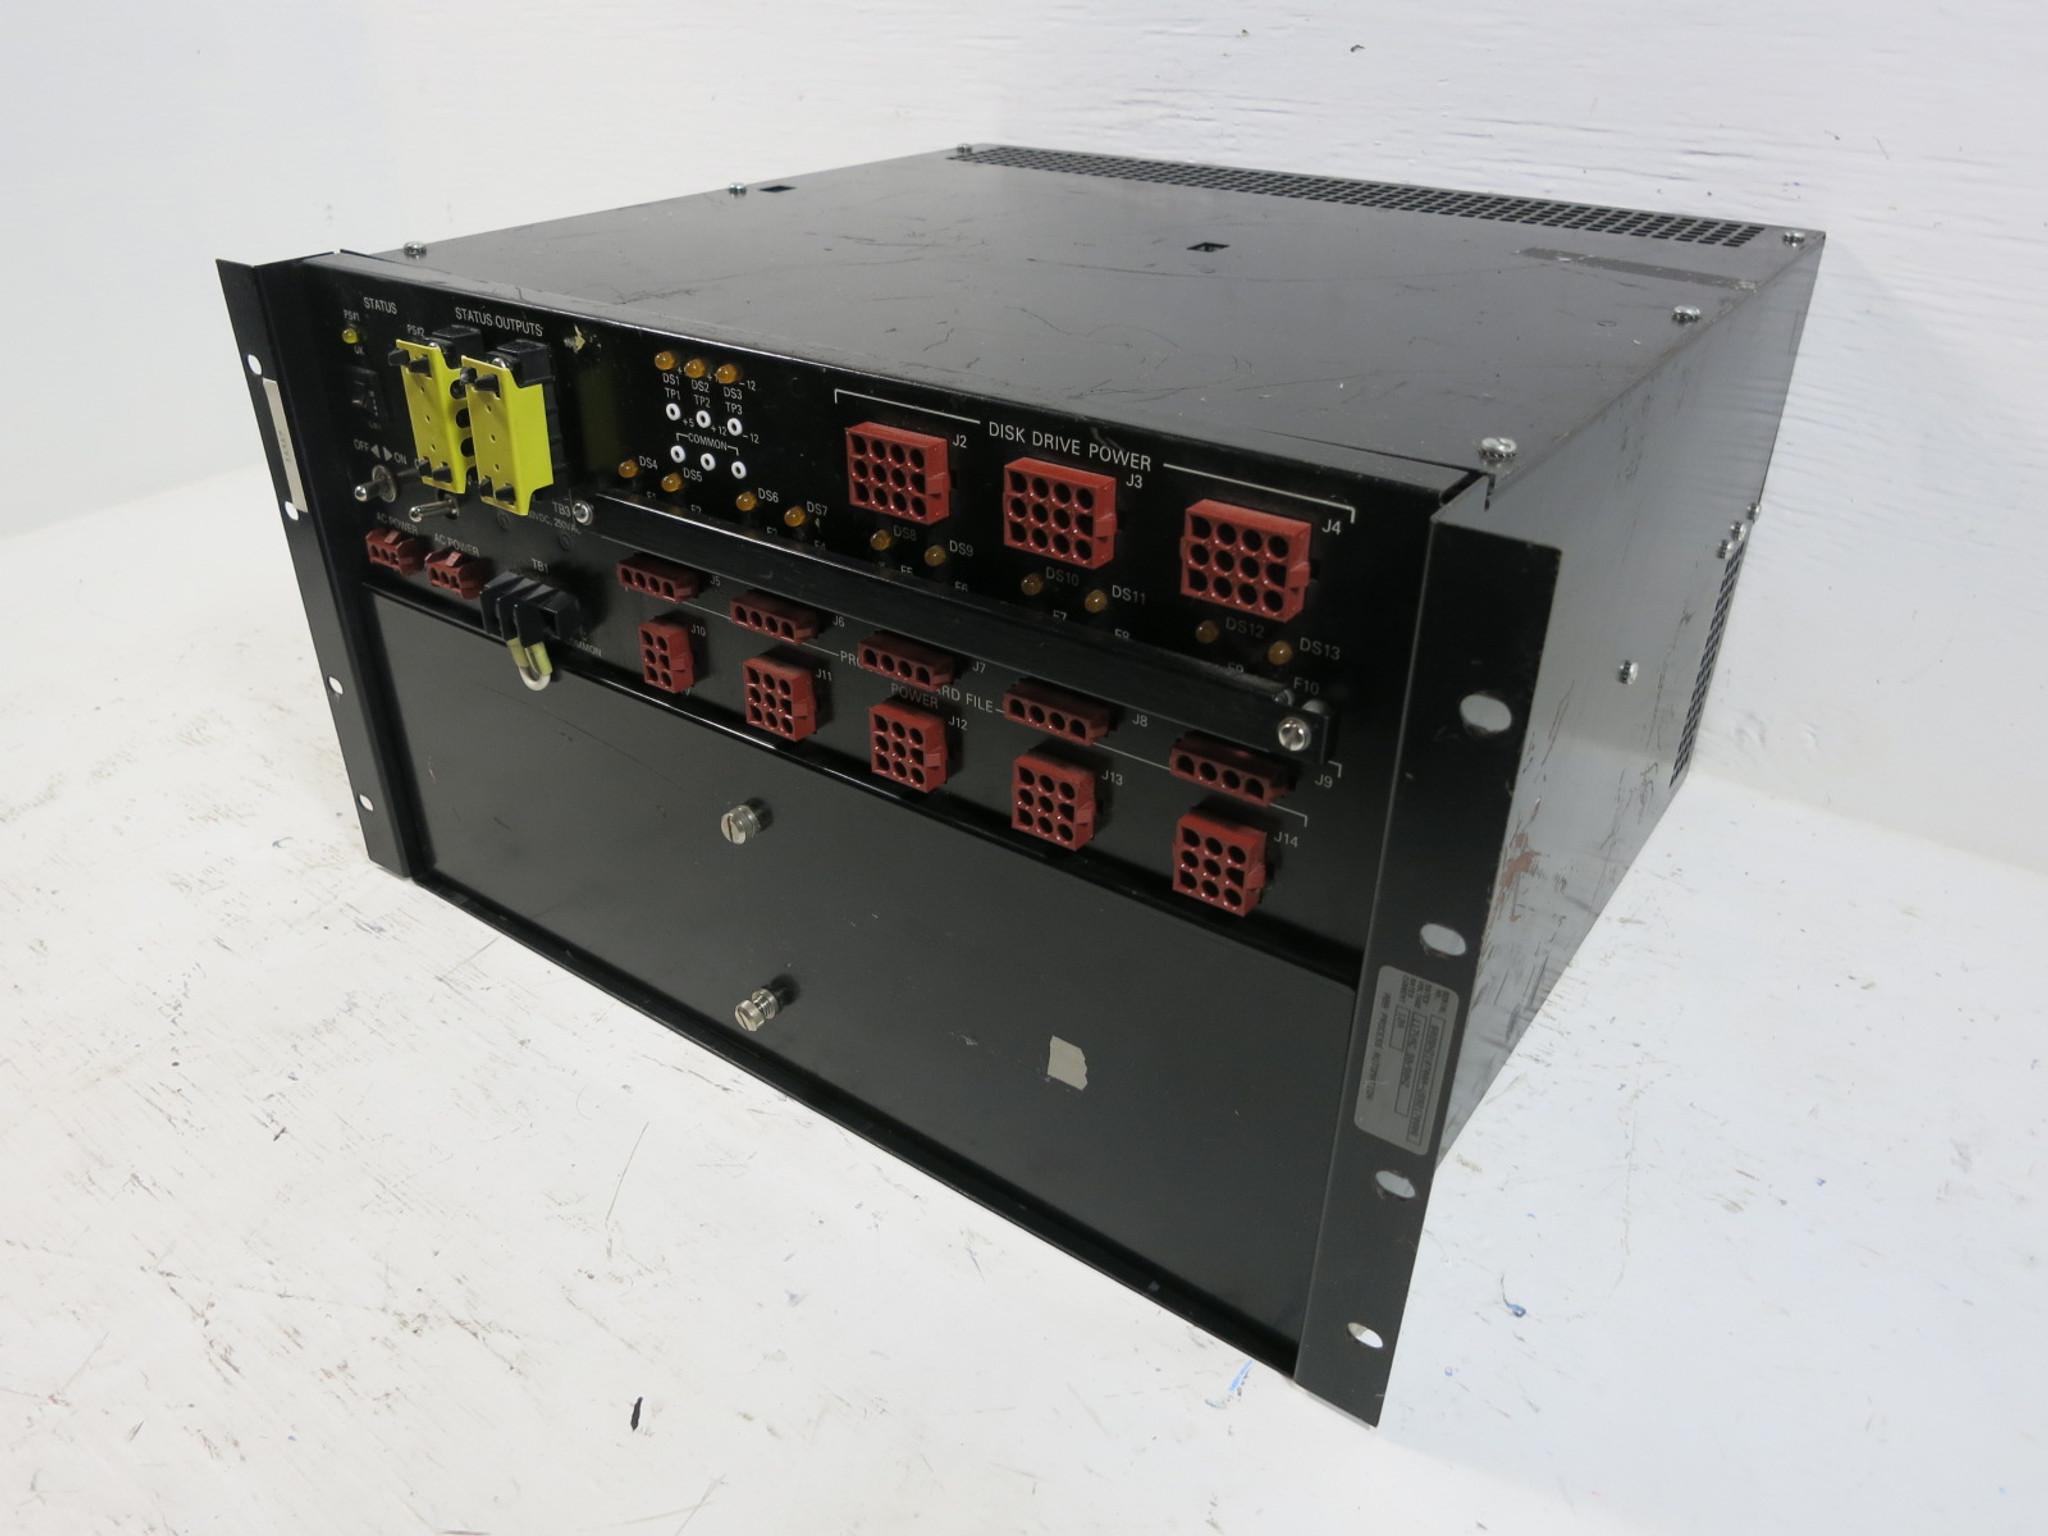 acdc electronics REV803B-2330-0000 800 Watts Power Supply Taylor ABB PLC  ASTEC (TK4783-1)